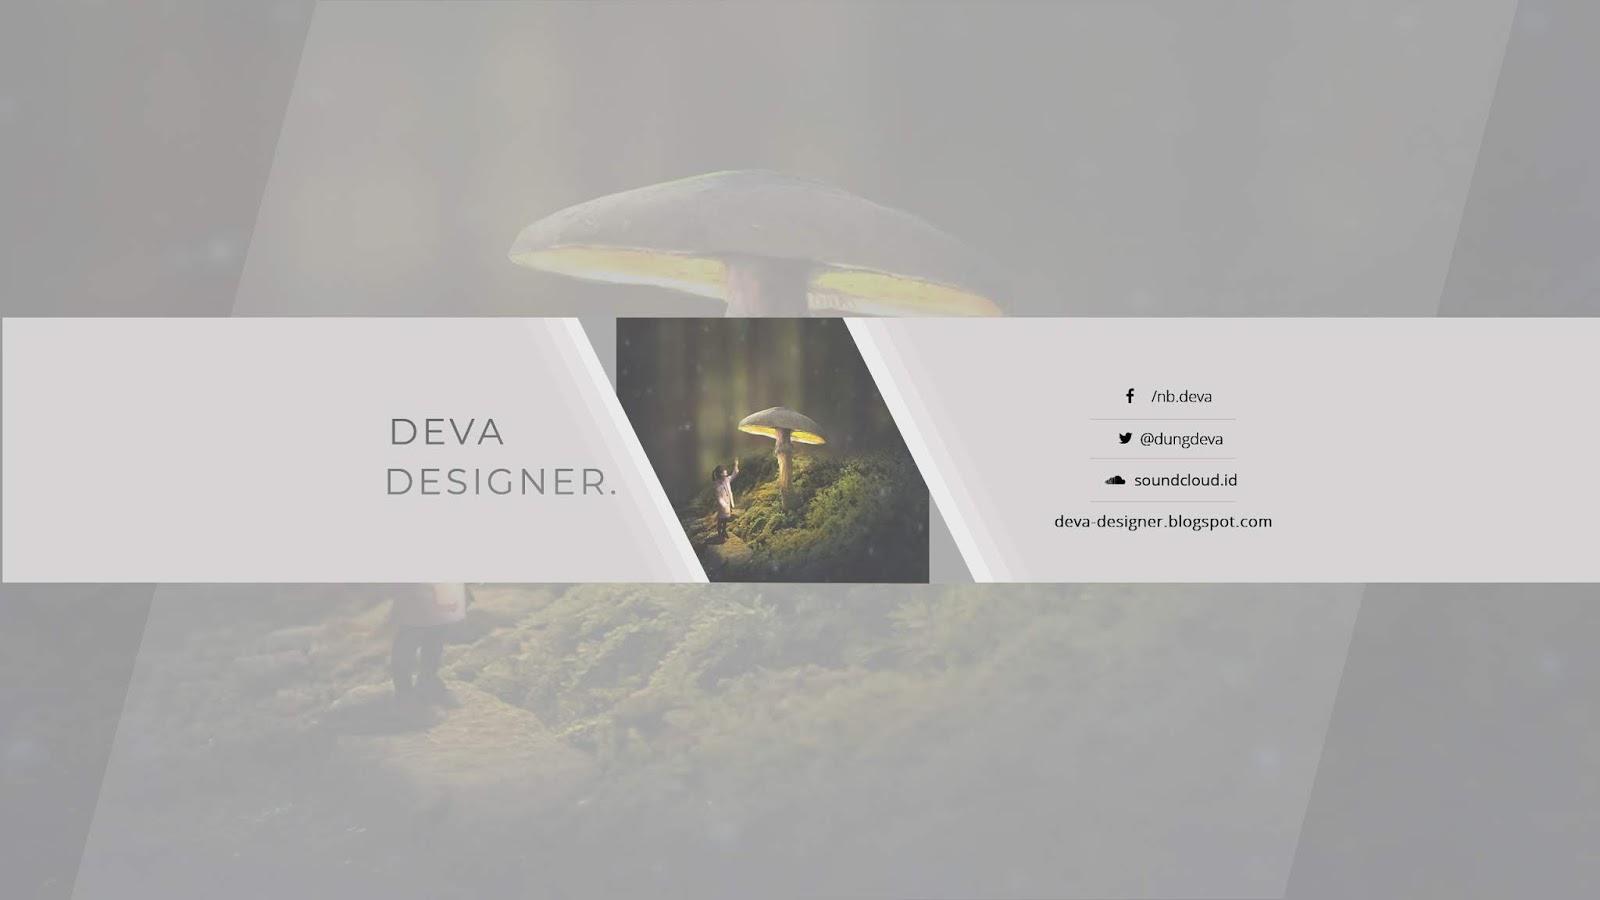 [PSD] 2 MẪU COVER YOUTUBE CỰC CHẤT | DEVA